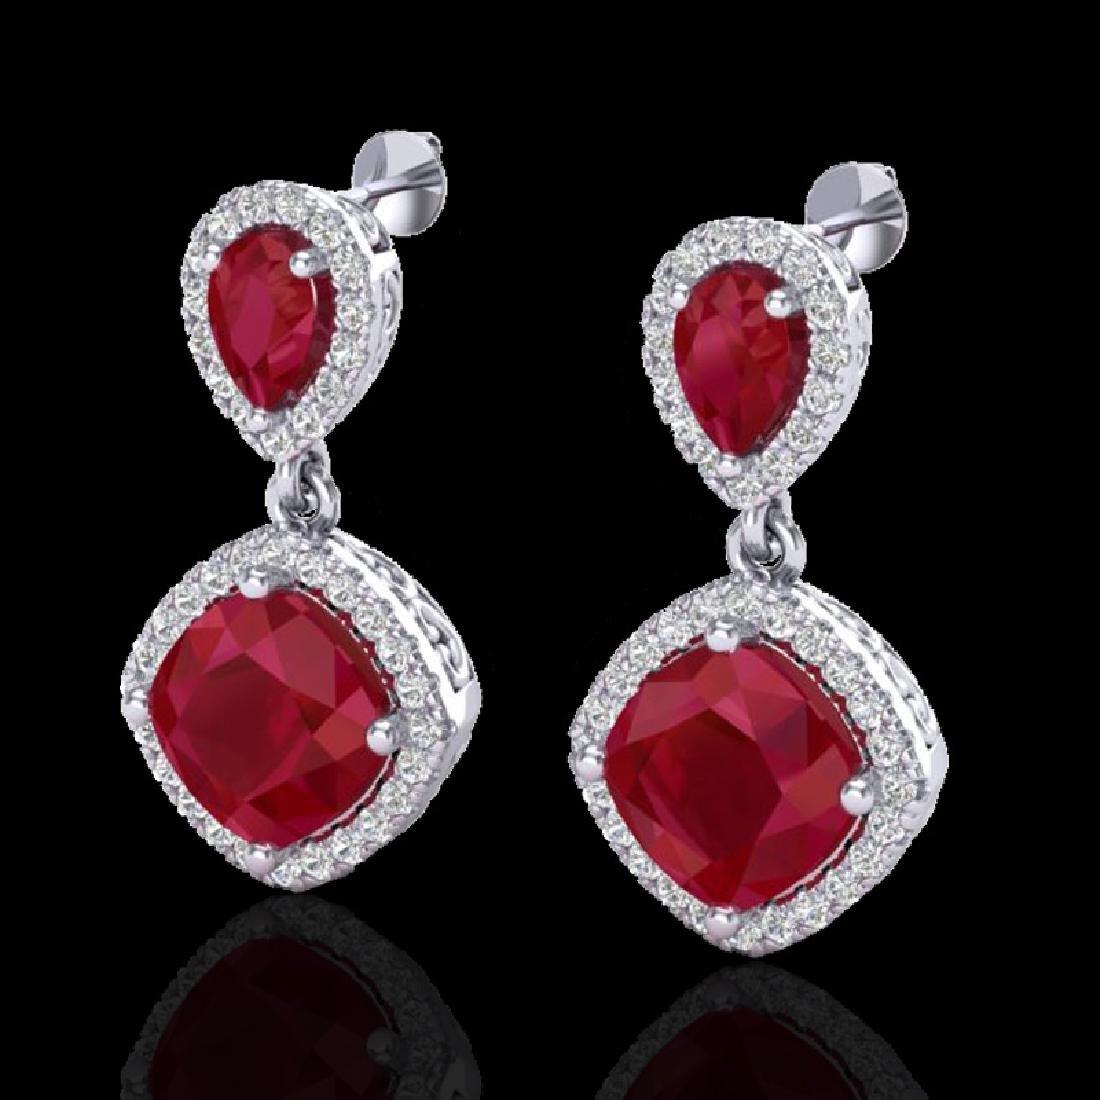 7 CTW Ruby & Micro Pave VS/SI Diamond Earrings Designer